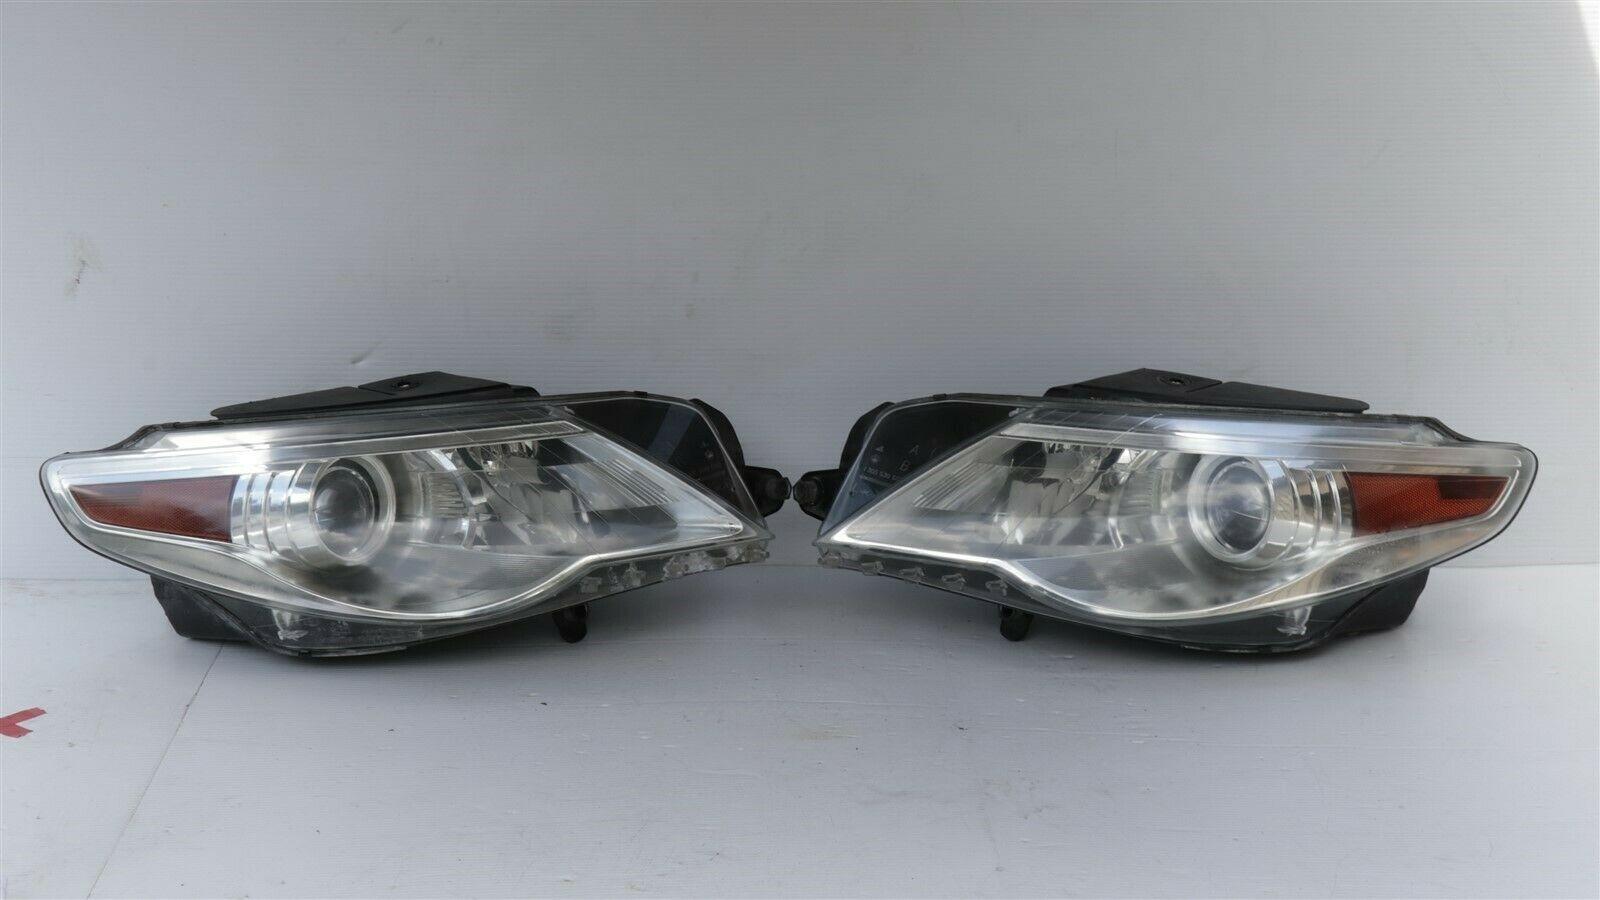 09-12 VW Volkswagen CC Xenon HID AFS Headlight Head Lights Matching Set L&R